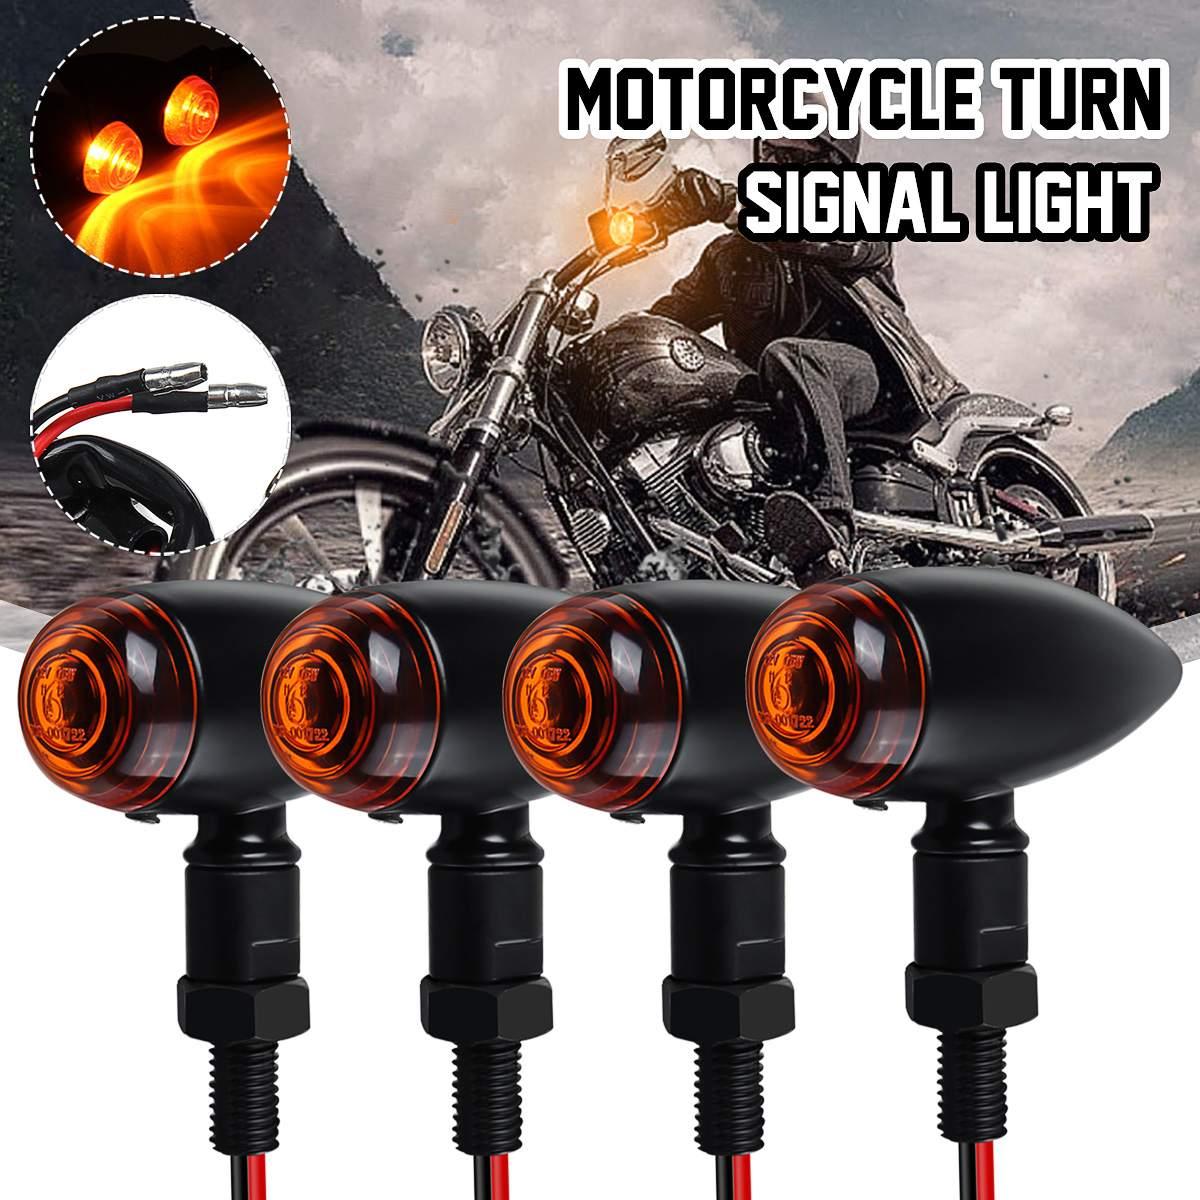 Universal 12V Motorcycle Turn Signal Lights Amber Indicator Lamps Retro Vintage E-Mark Approved For Harley/Honda/Yamaha/Suzuki